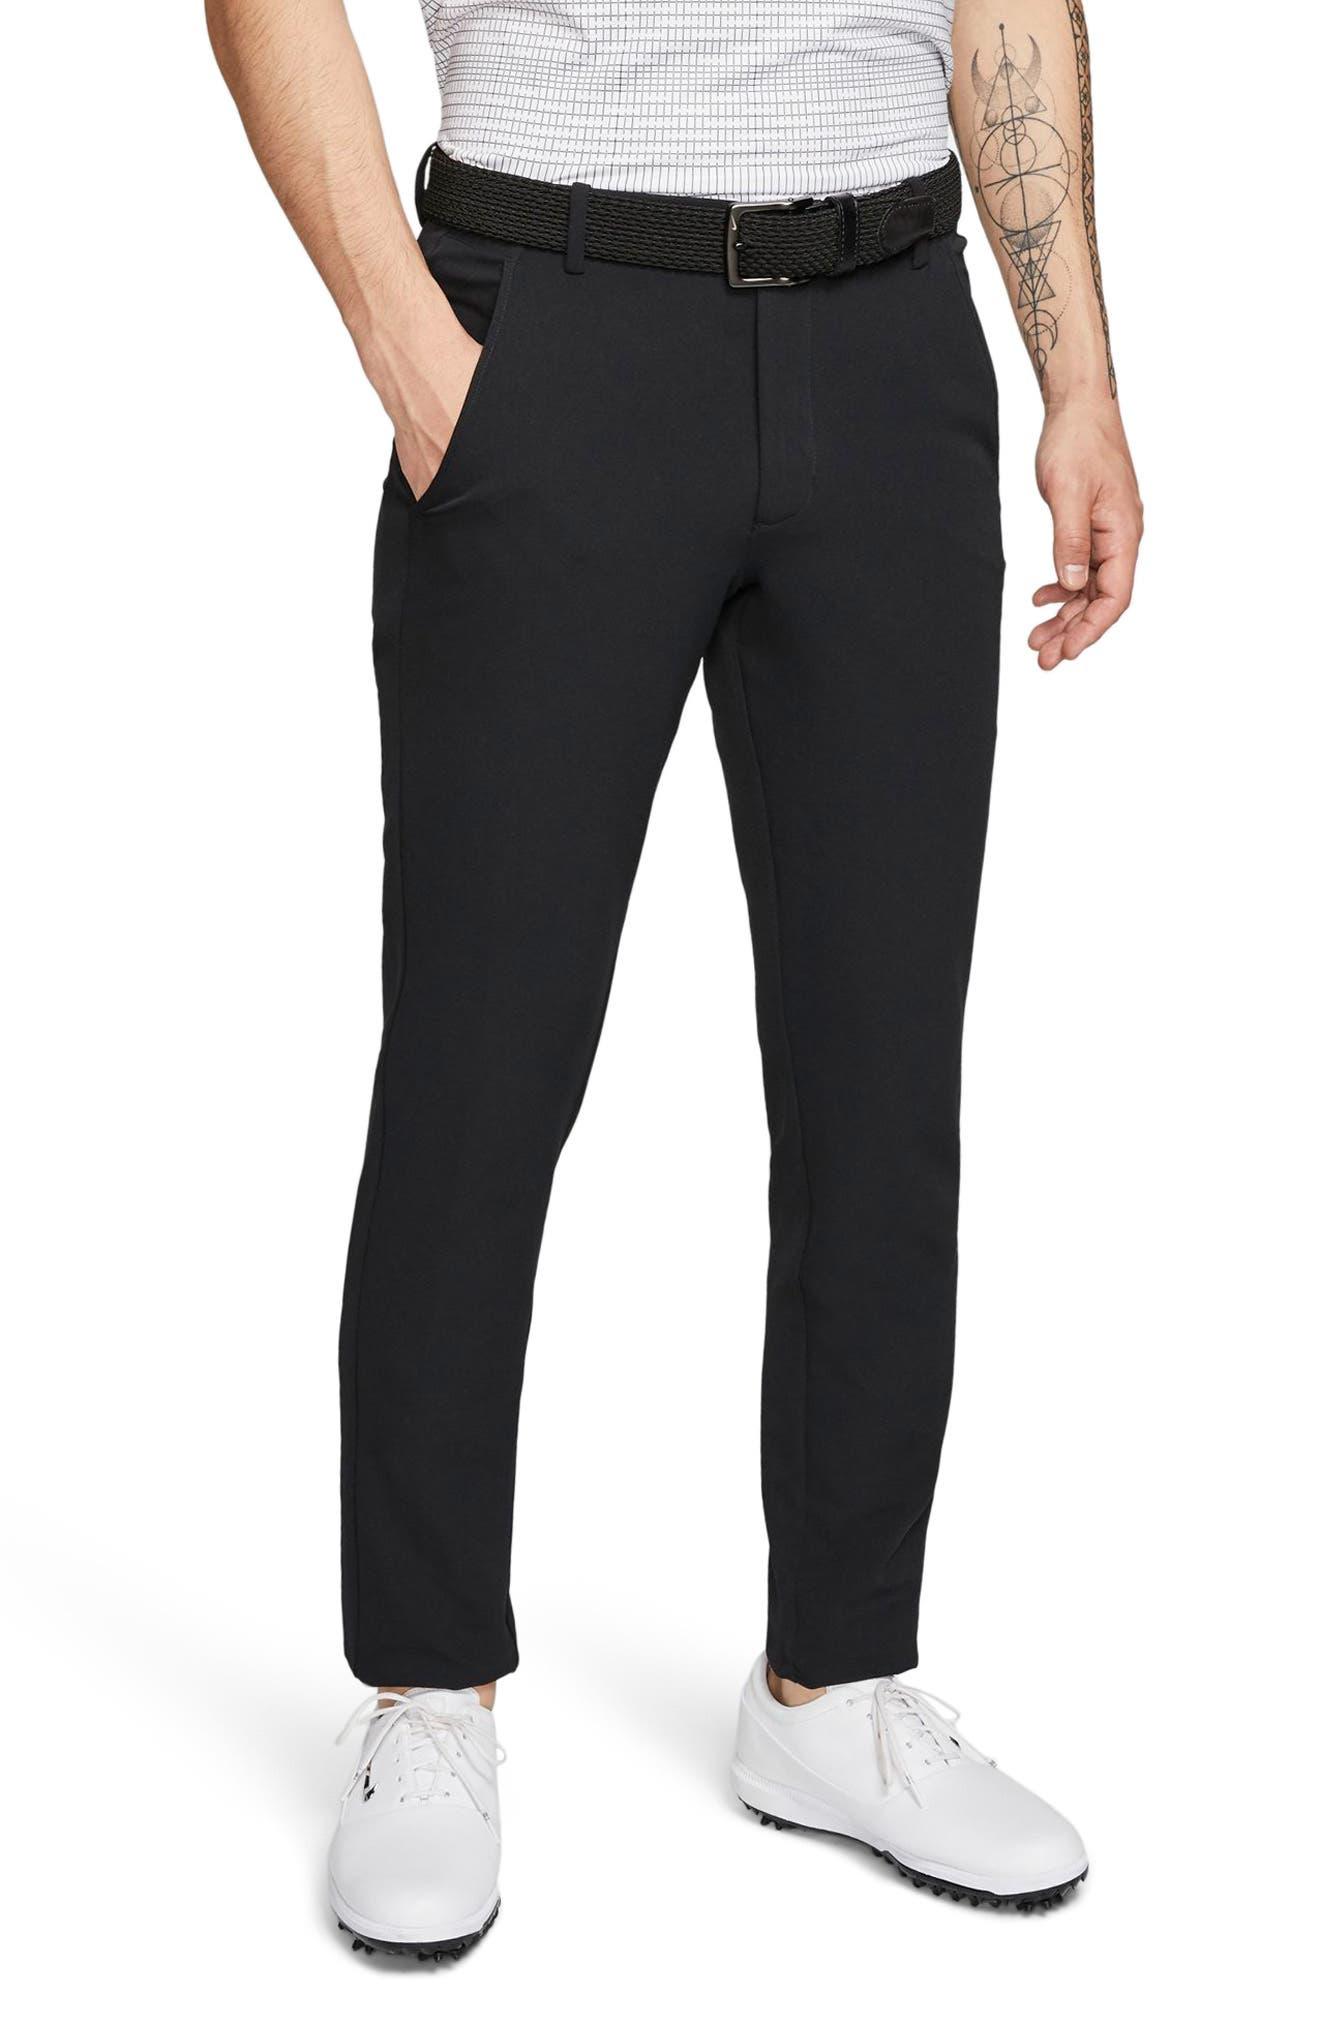 Nike Flex Vapor Slim Fit Golf Pants